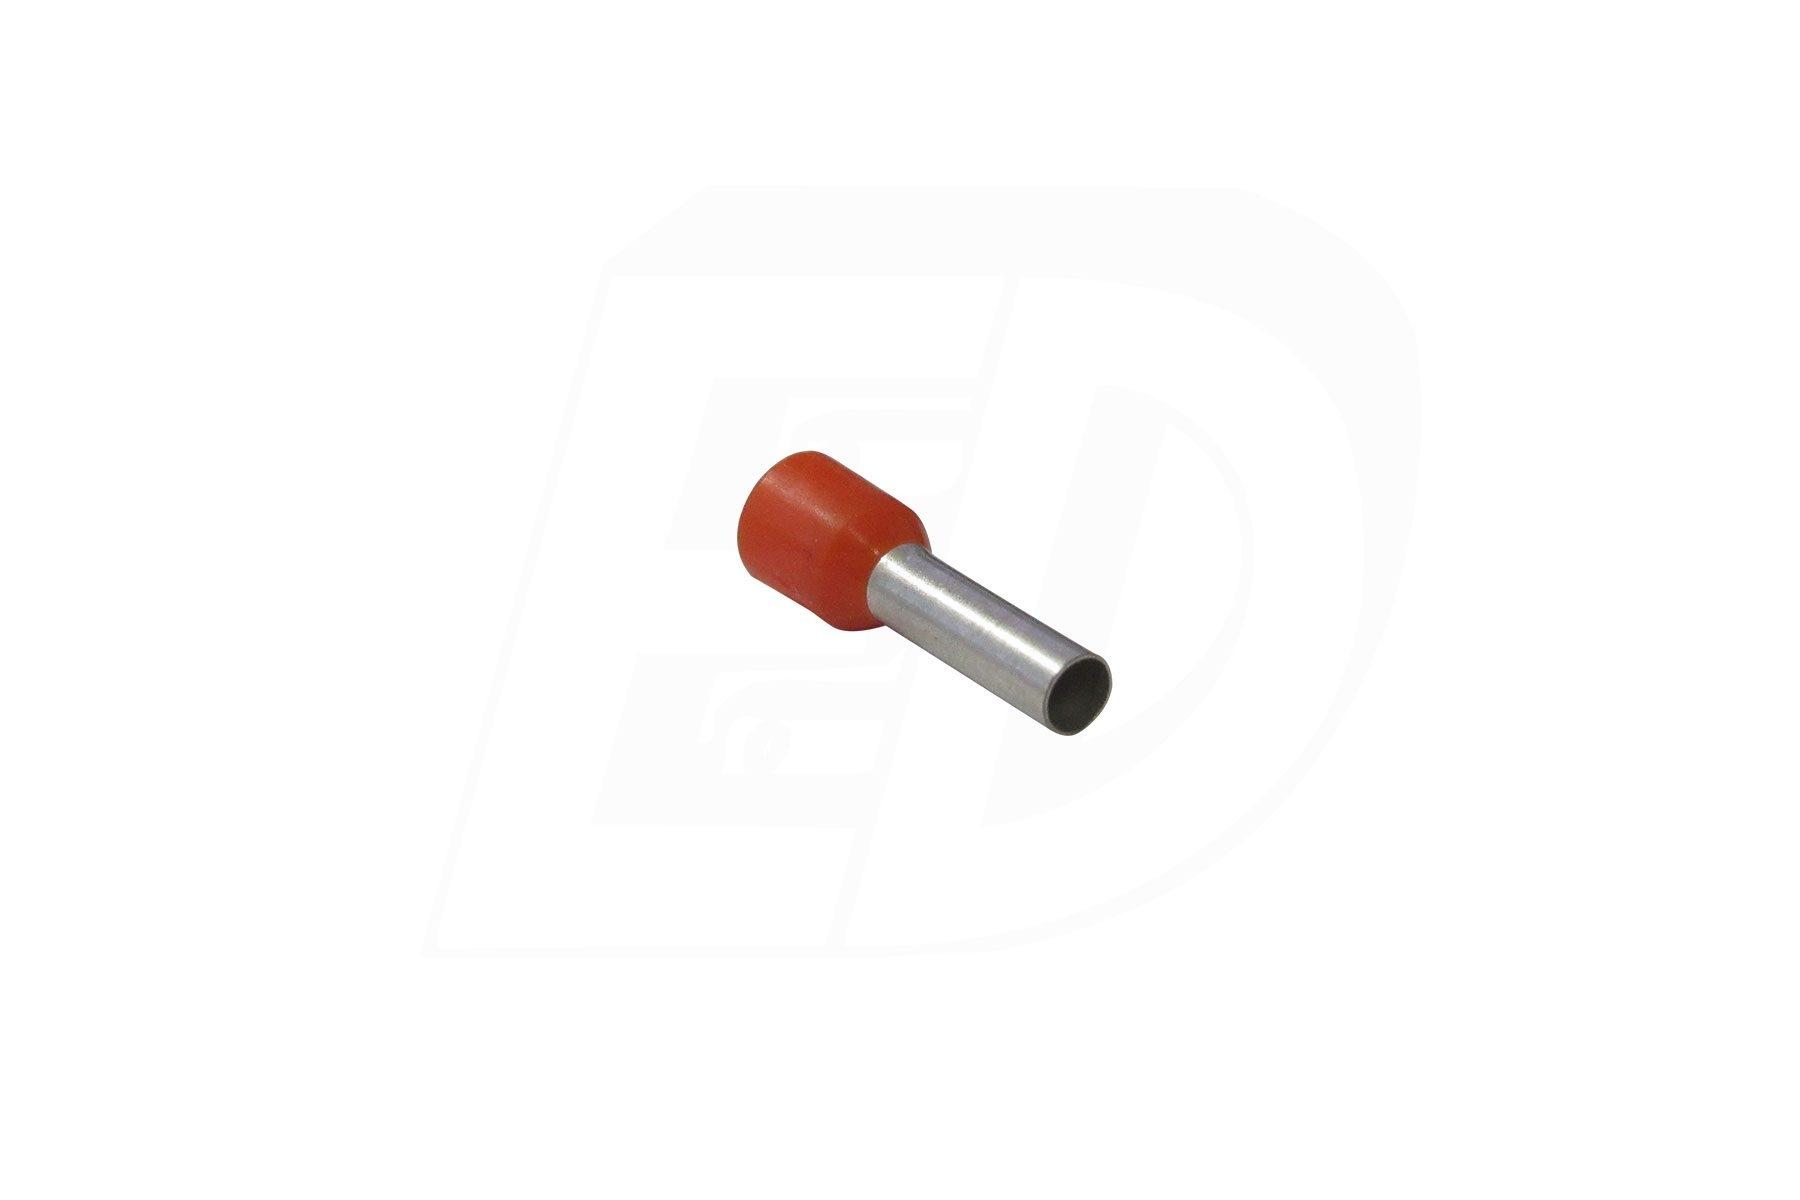 Brazed Seam Nylon Insulated Ferrule Connectors 12 AWG